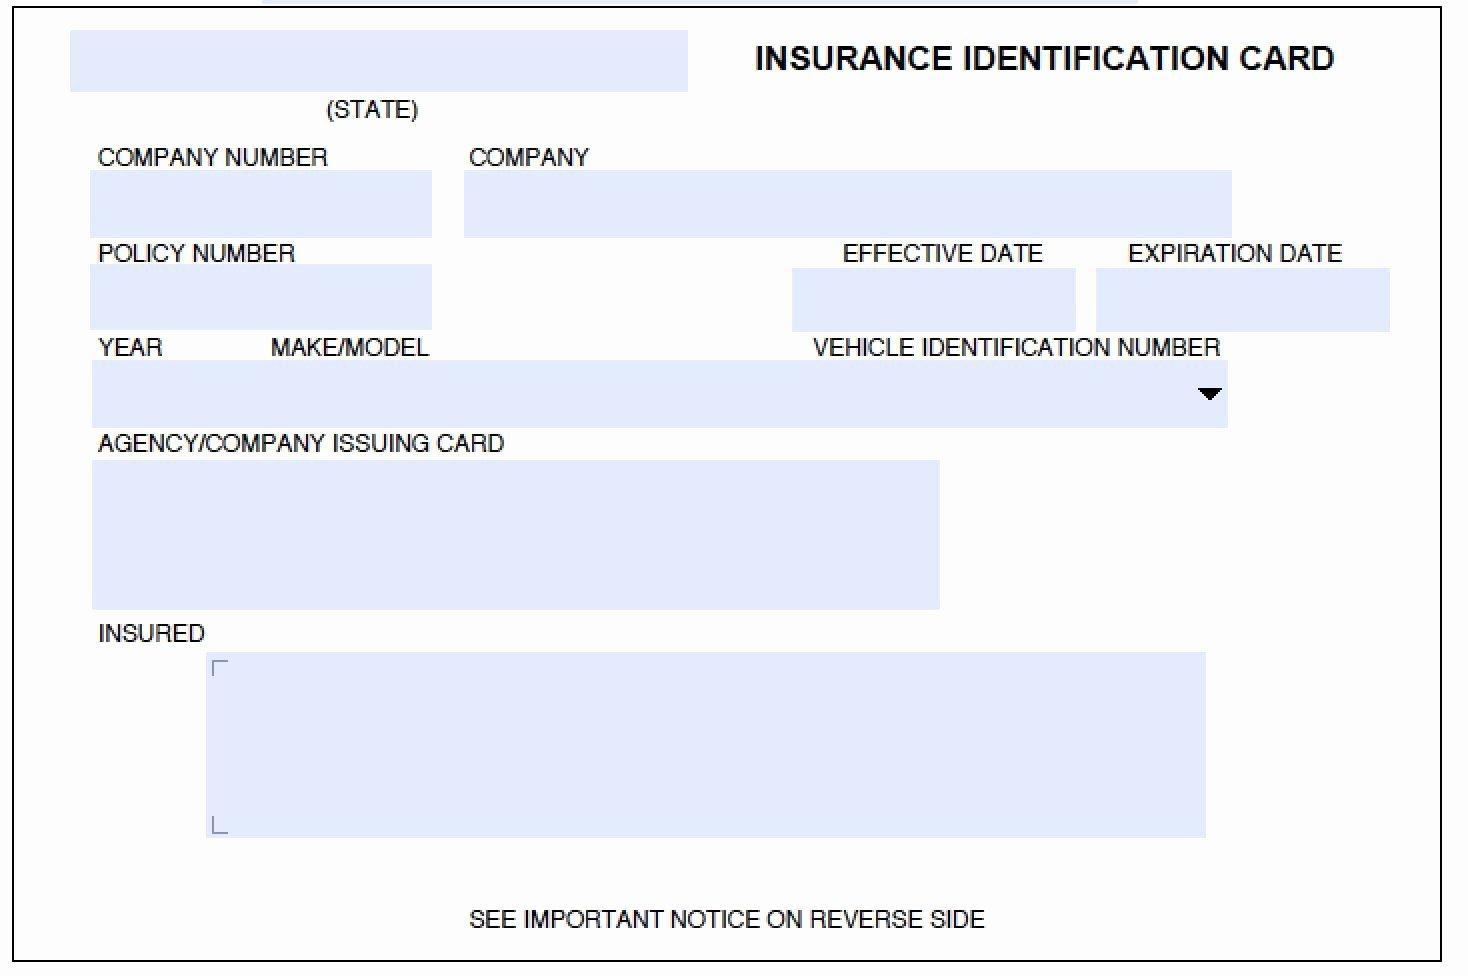 Car Insurance Certificate Template Inspirational Auto Insurance Certificate Template How I Successfuly